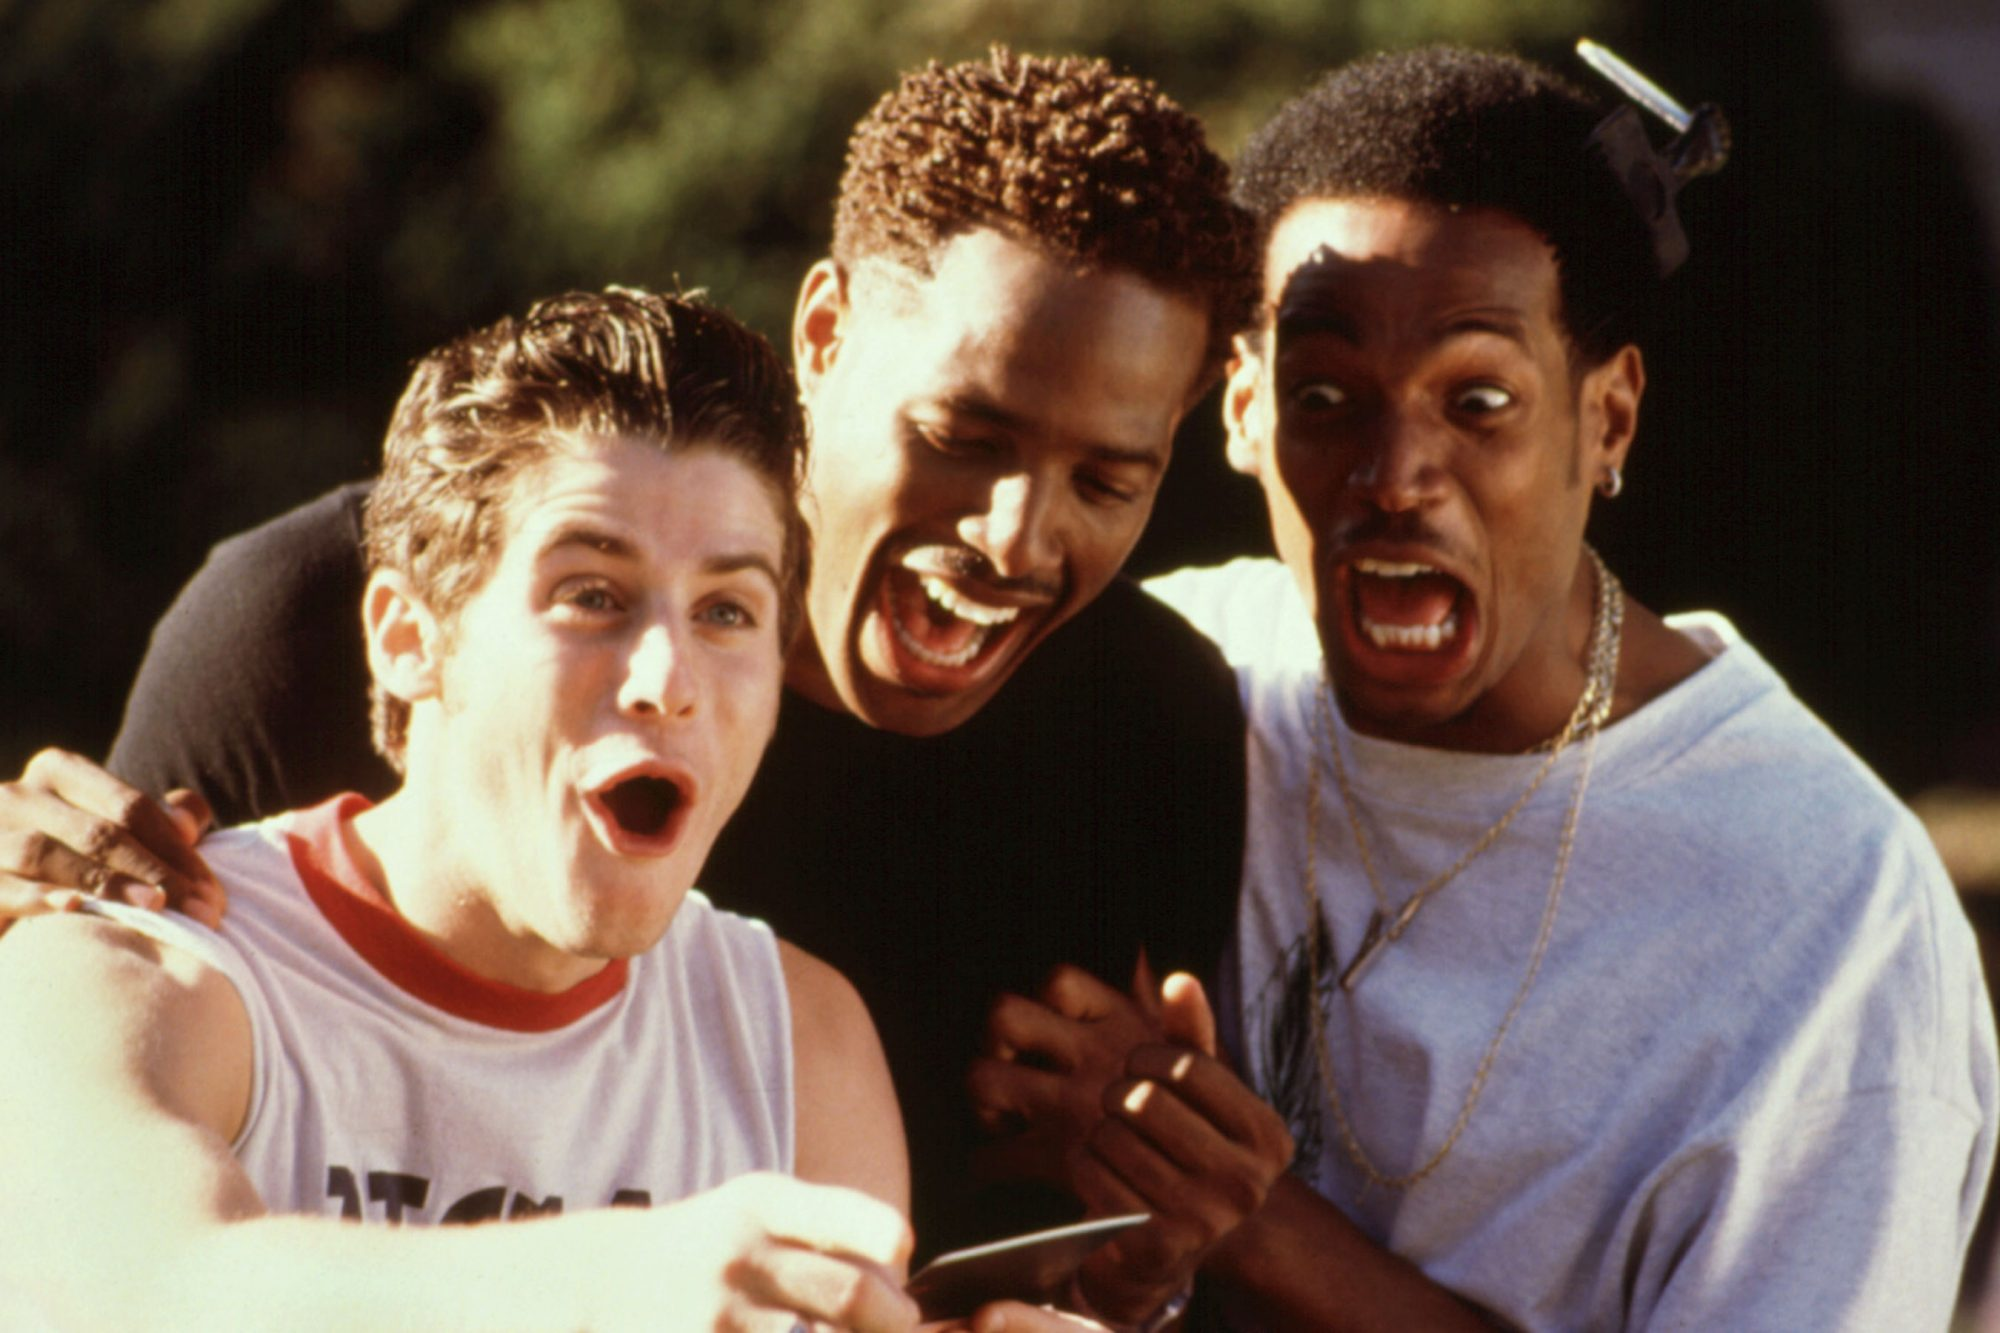 SCARY MOVIE, Jon Abrahams, Shawn Wayans, Marlon Wayans, 2000